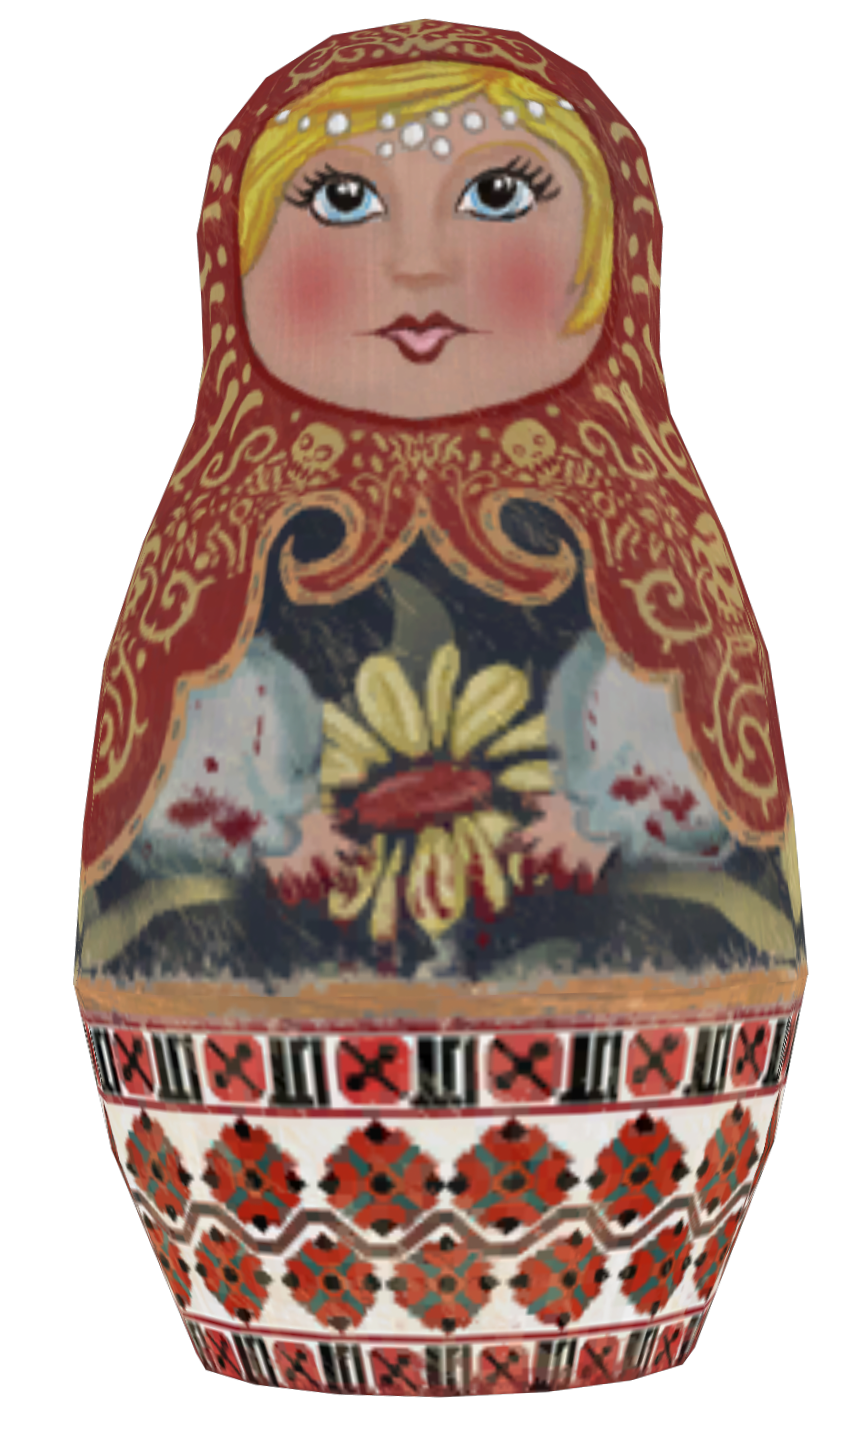 Matryoshka Doll | Call of Duty Wiki | FANDOM powered by Wikia